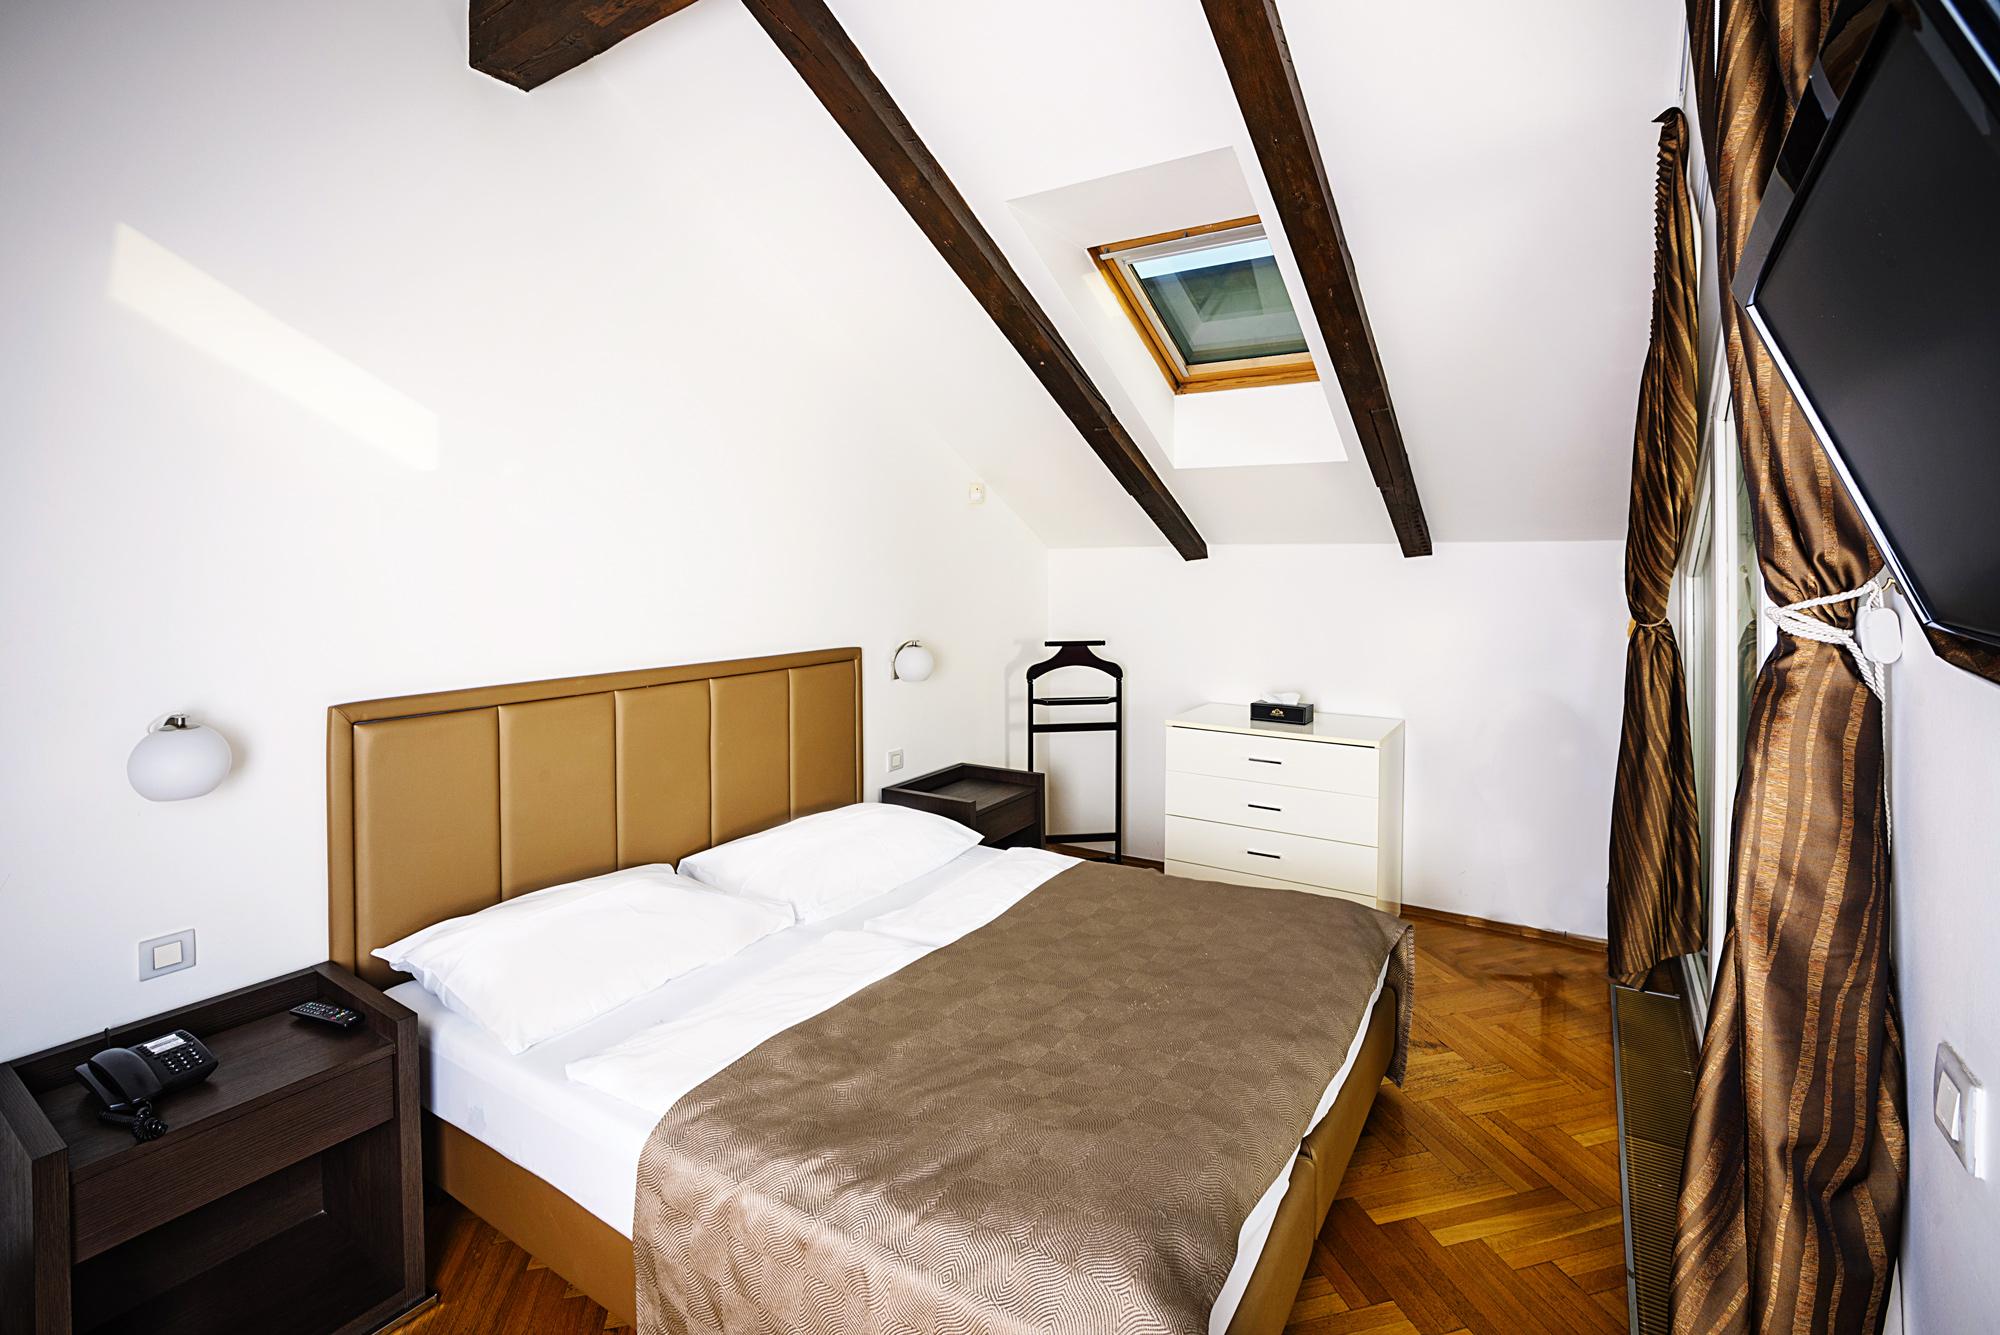 Attic Suite Apartments Deminka Palace Prague